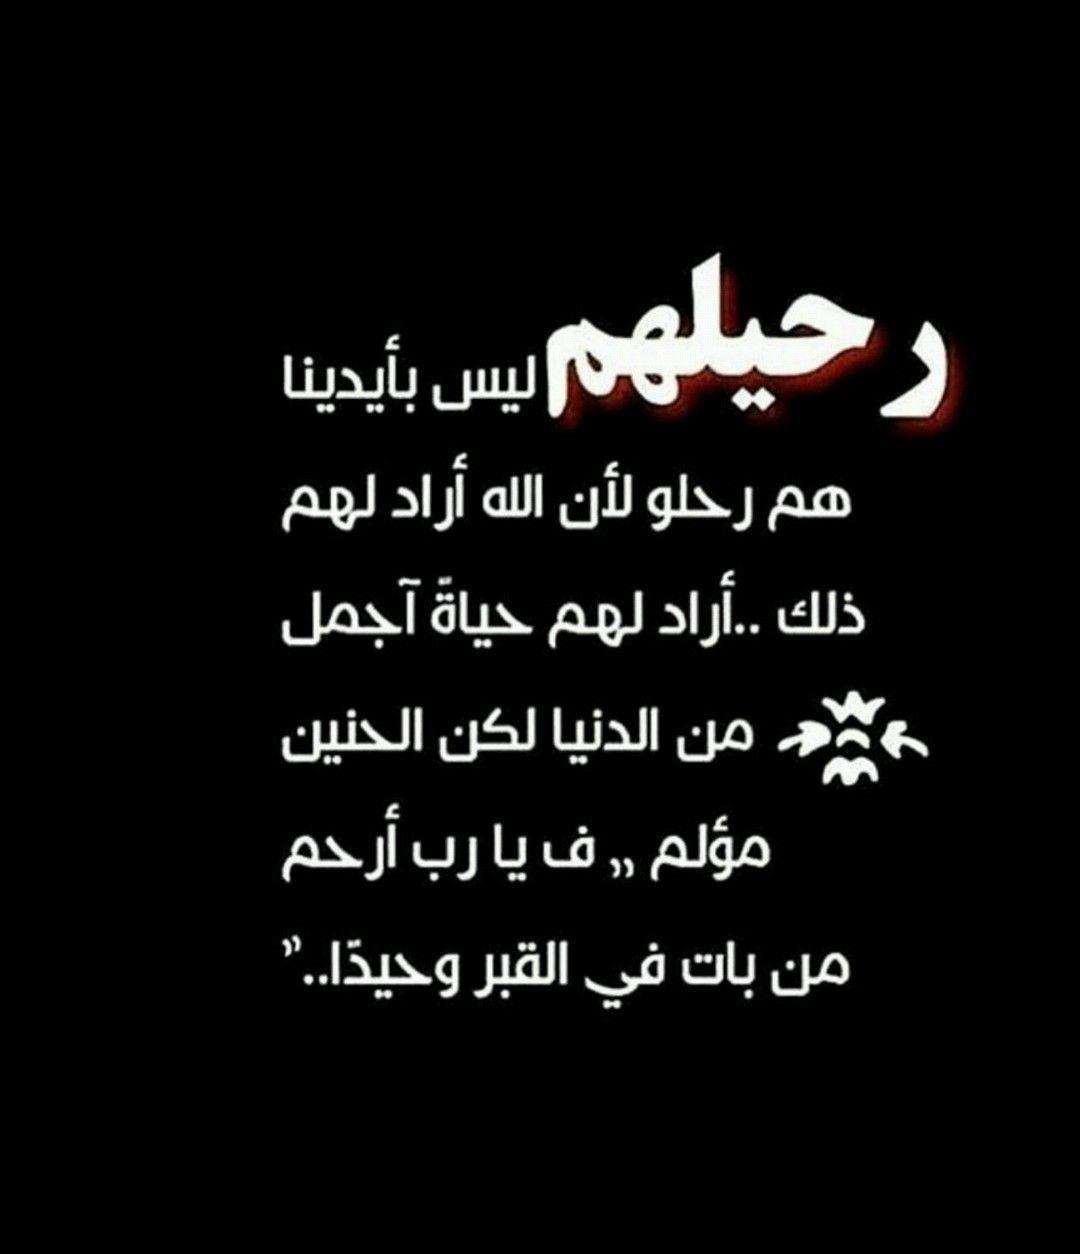 اللهم ارحم أبي أحمد بووركان In 2021 Beautiful Quran Quotes Calligraphy Words Quotes